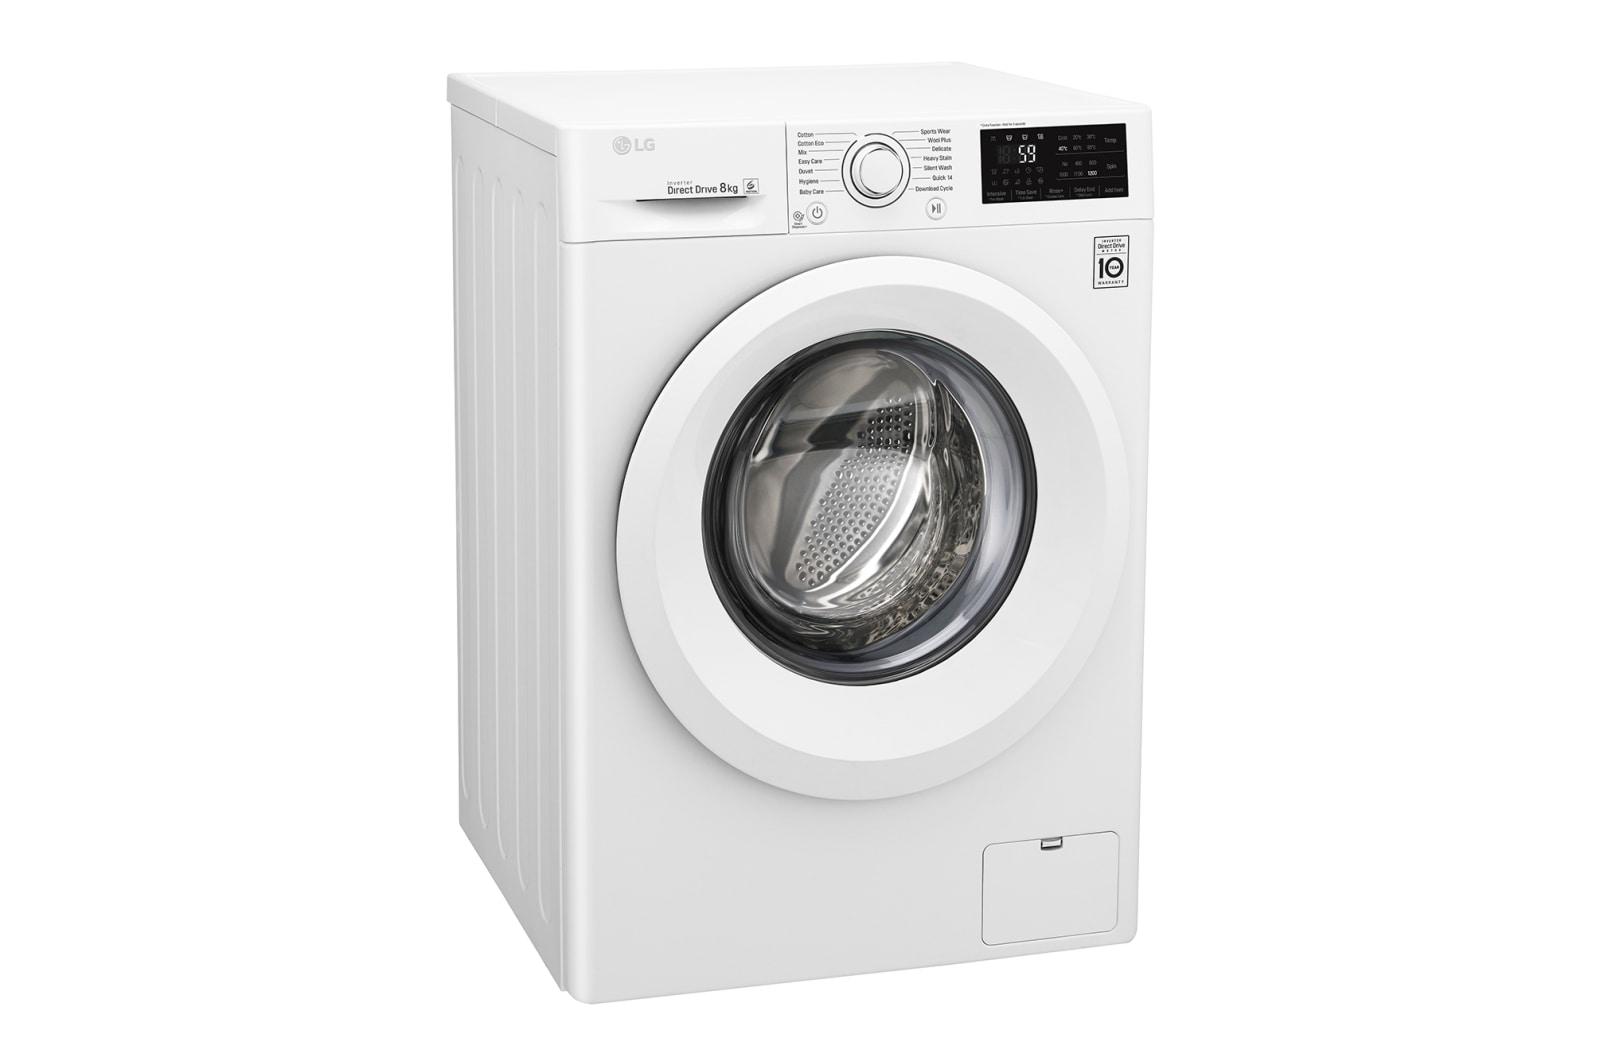 LG Front Load Washing Machines | WD1208TC4W Front Loader | LG Australia